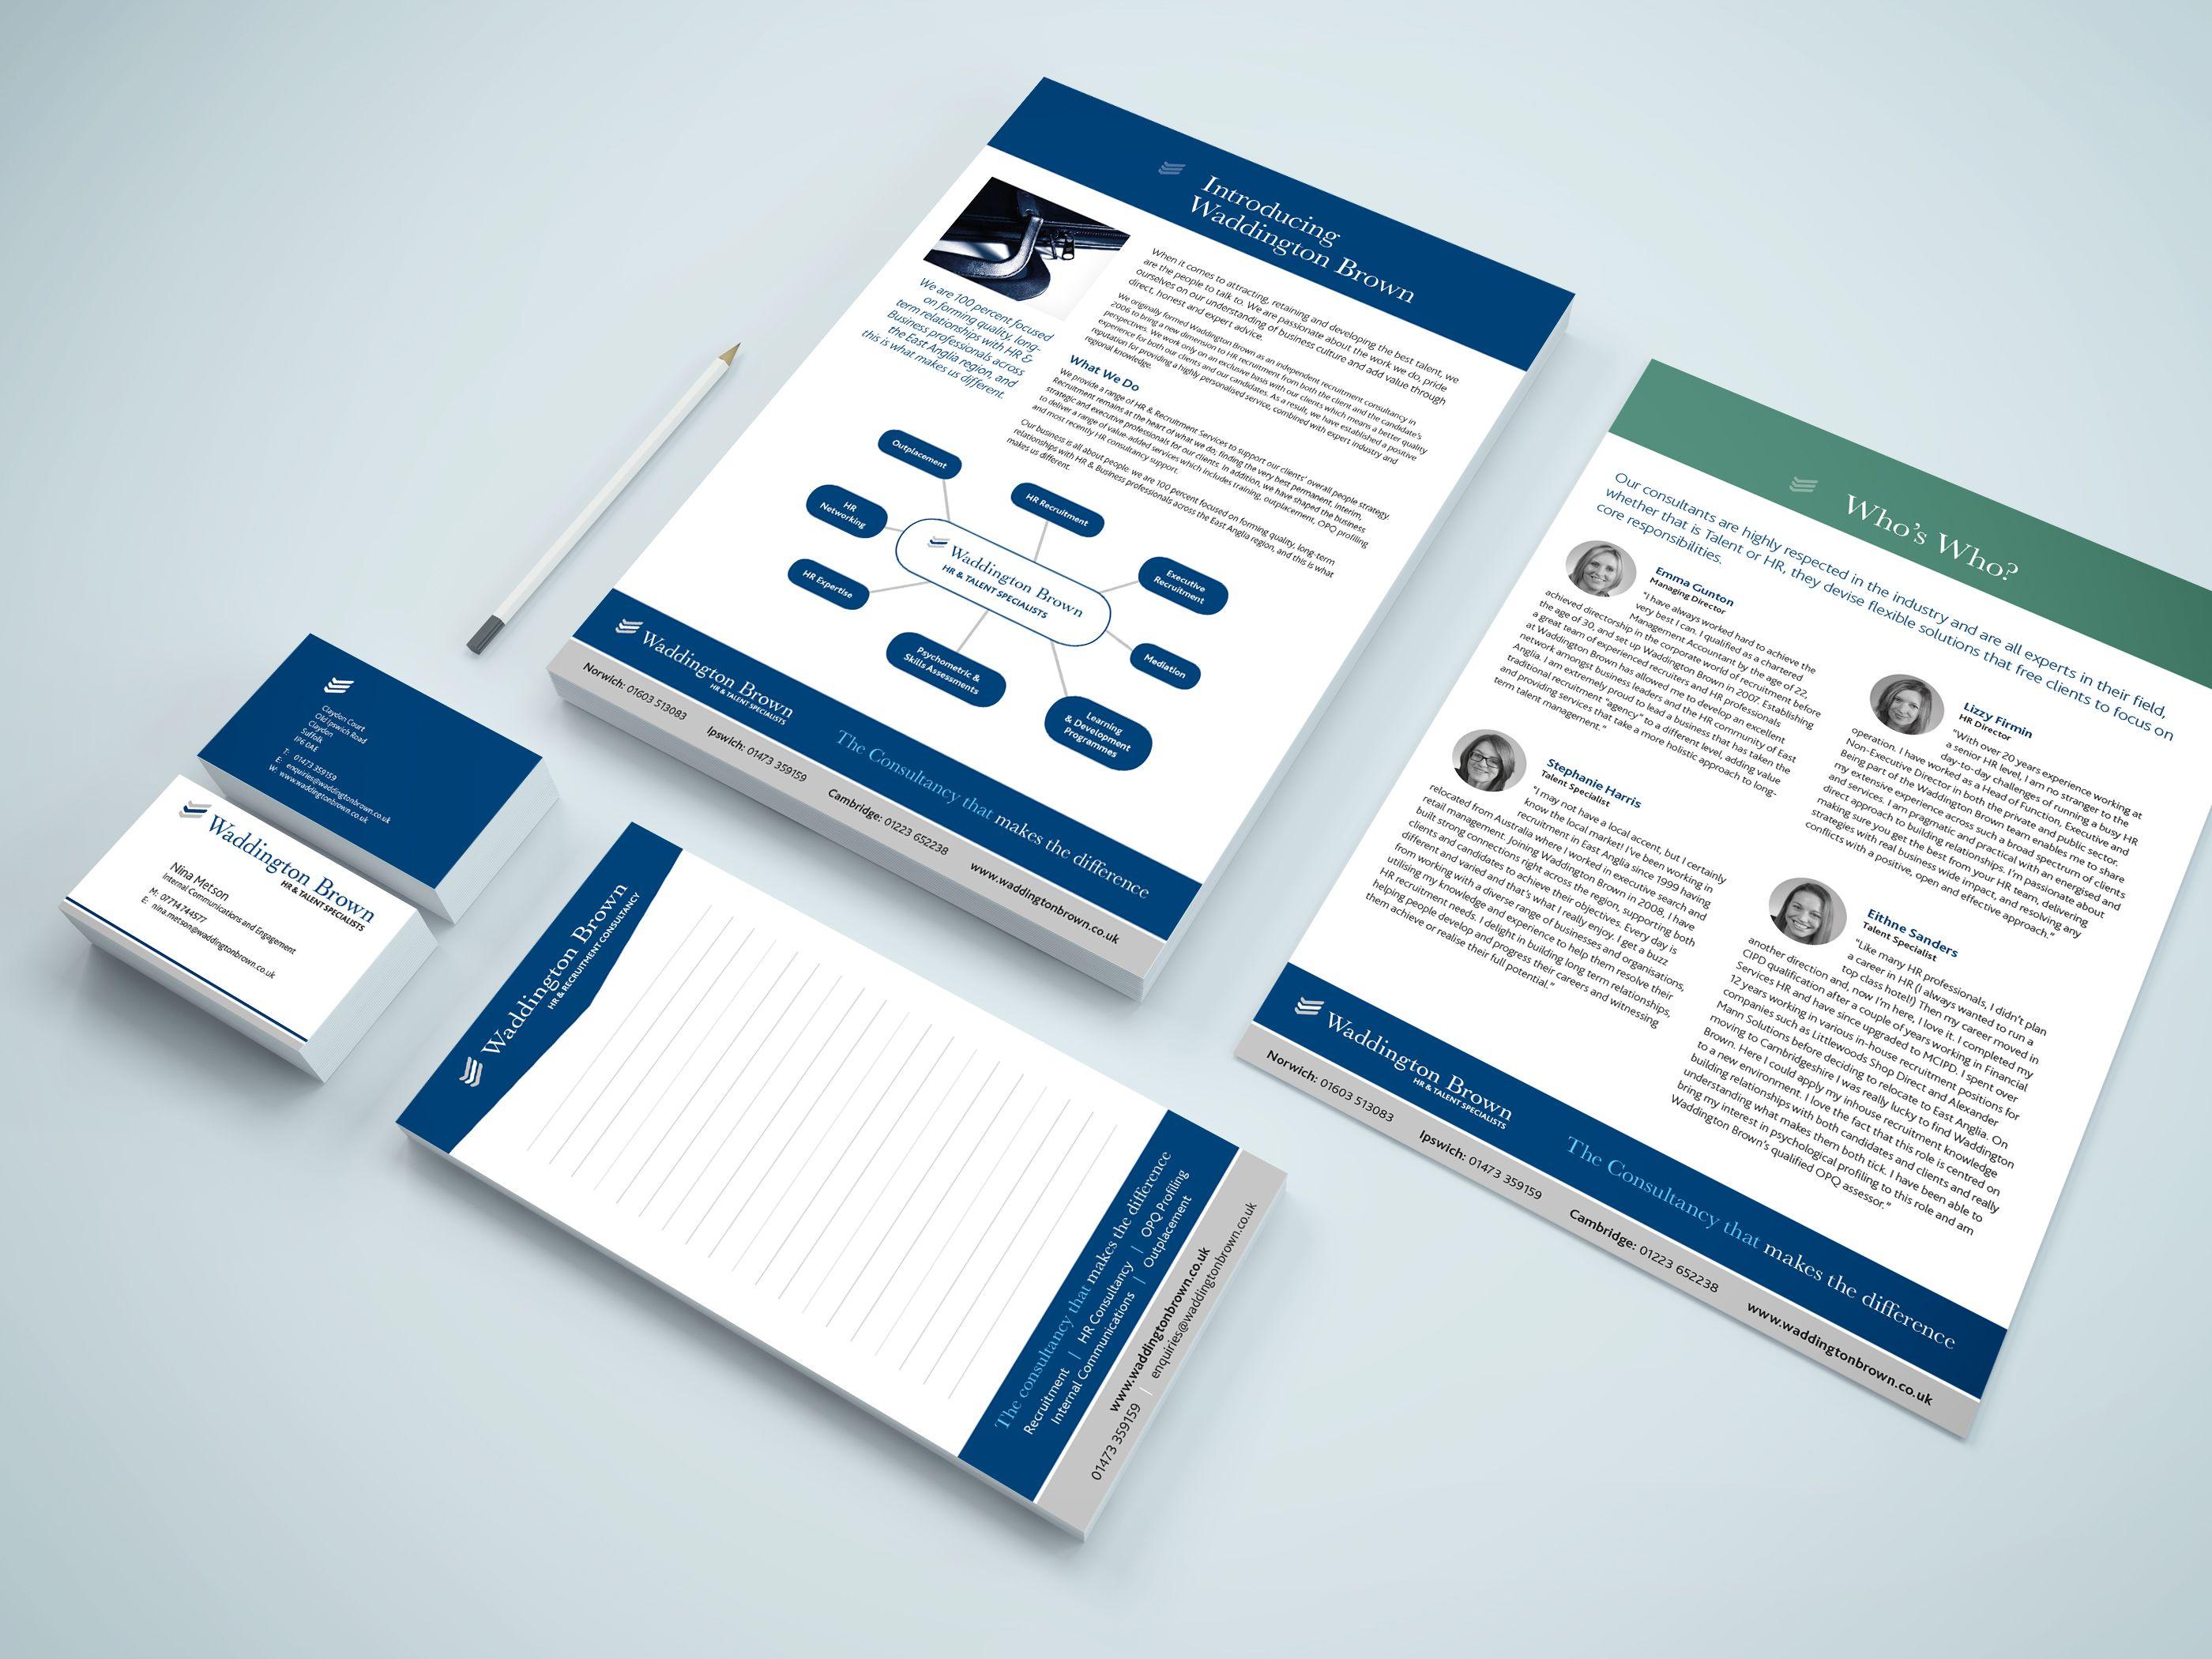 Waddington Brown Stationery Printing Business Cards Digital Printing Services Digital Prints